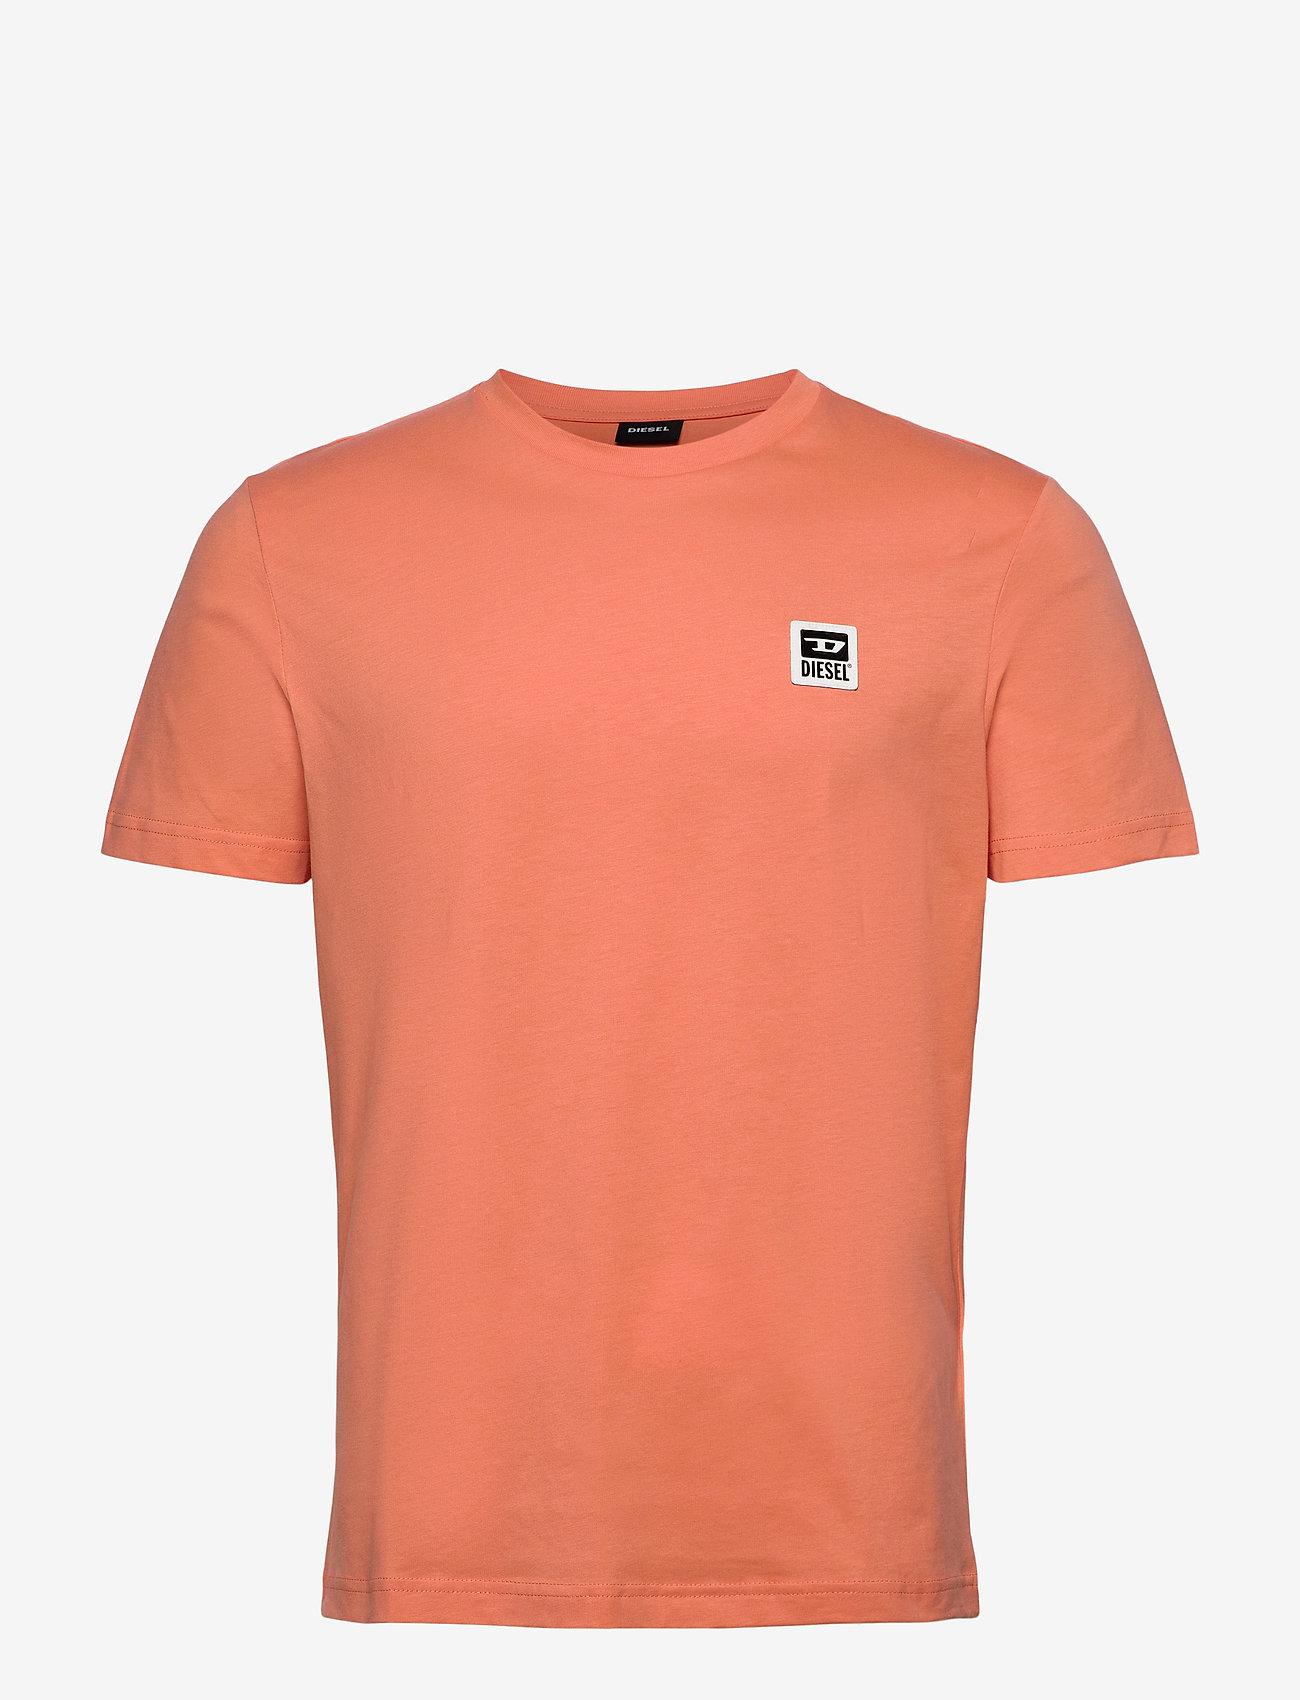 Diesel Men - T-DIEGOS-K30 T-SHIRT - basic t-shirts - orange - 0